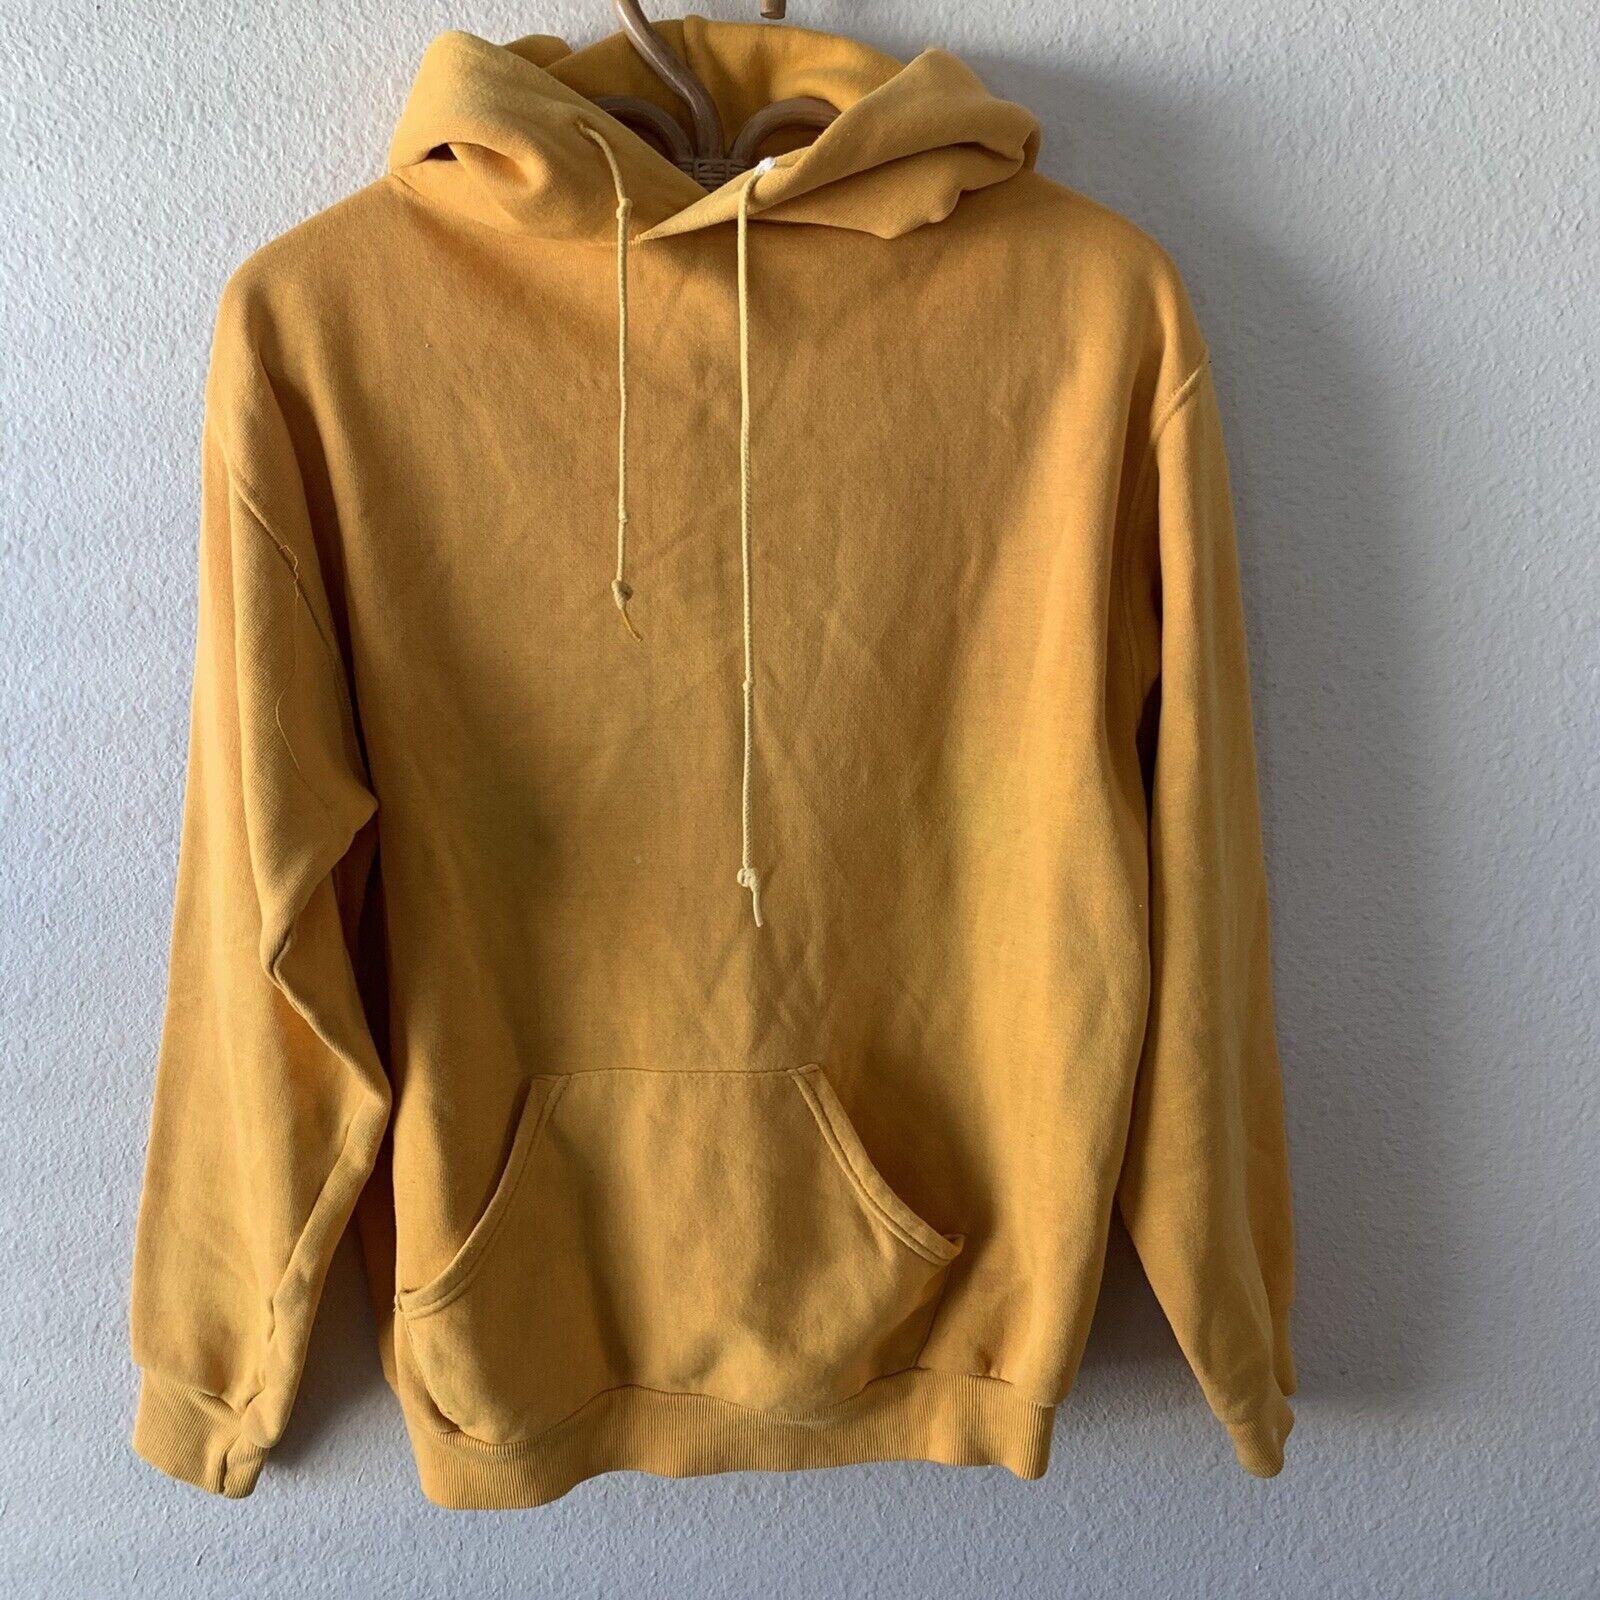 Vintage 70s Hoodie Sweatshirt Junior Olympics Rus… - image 2